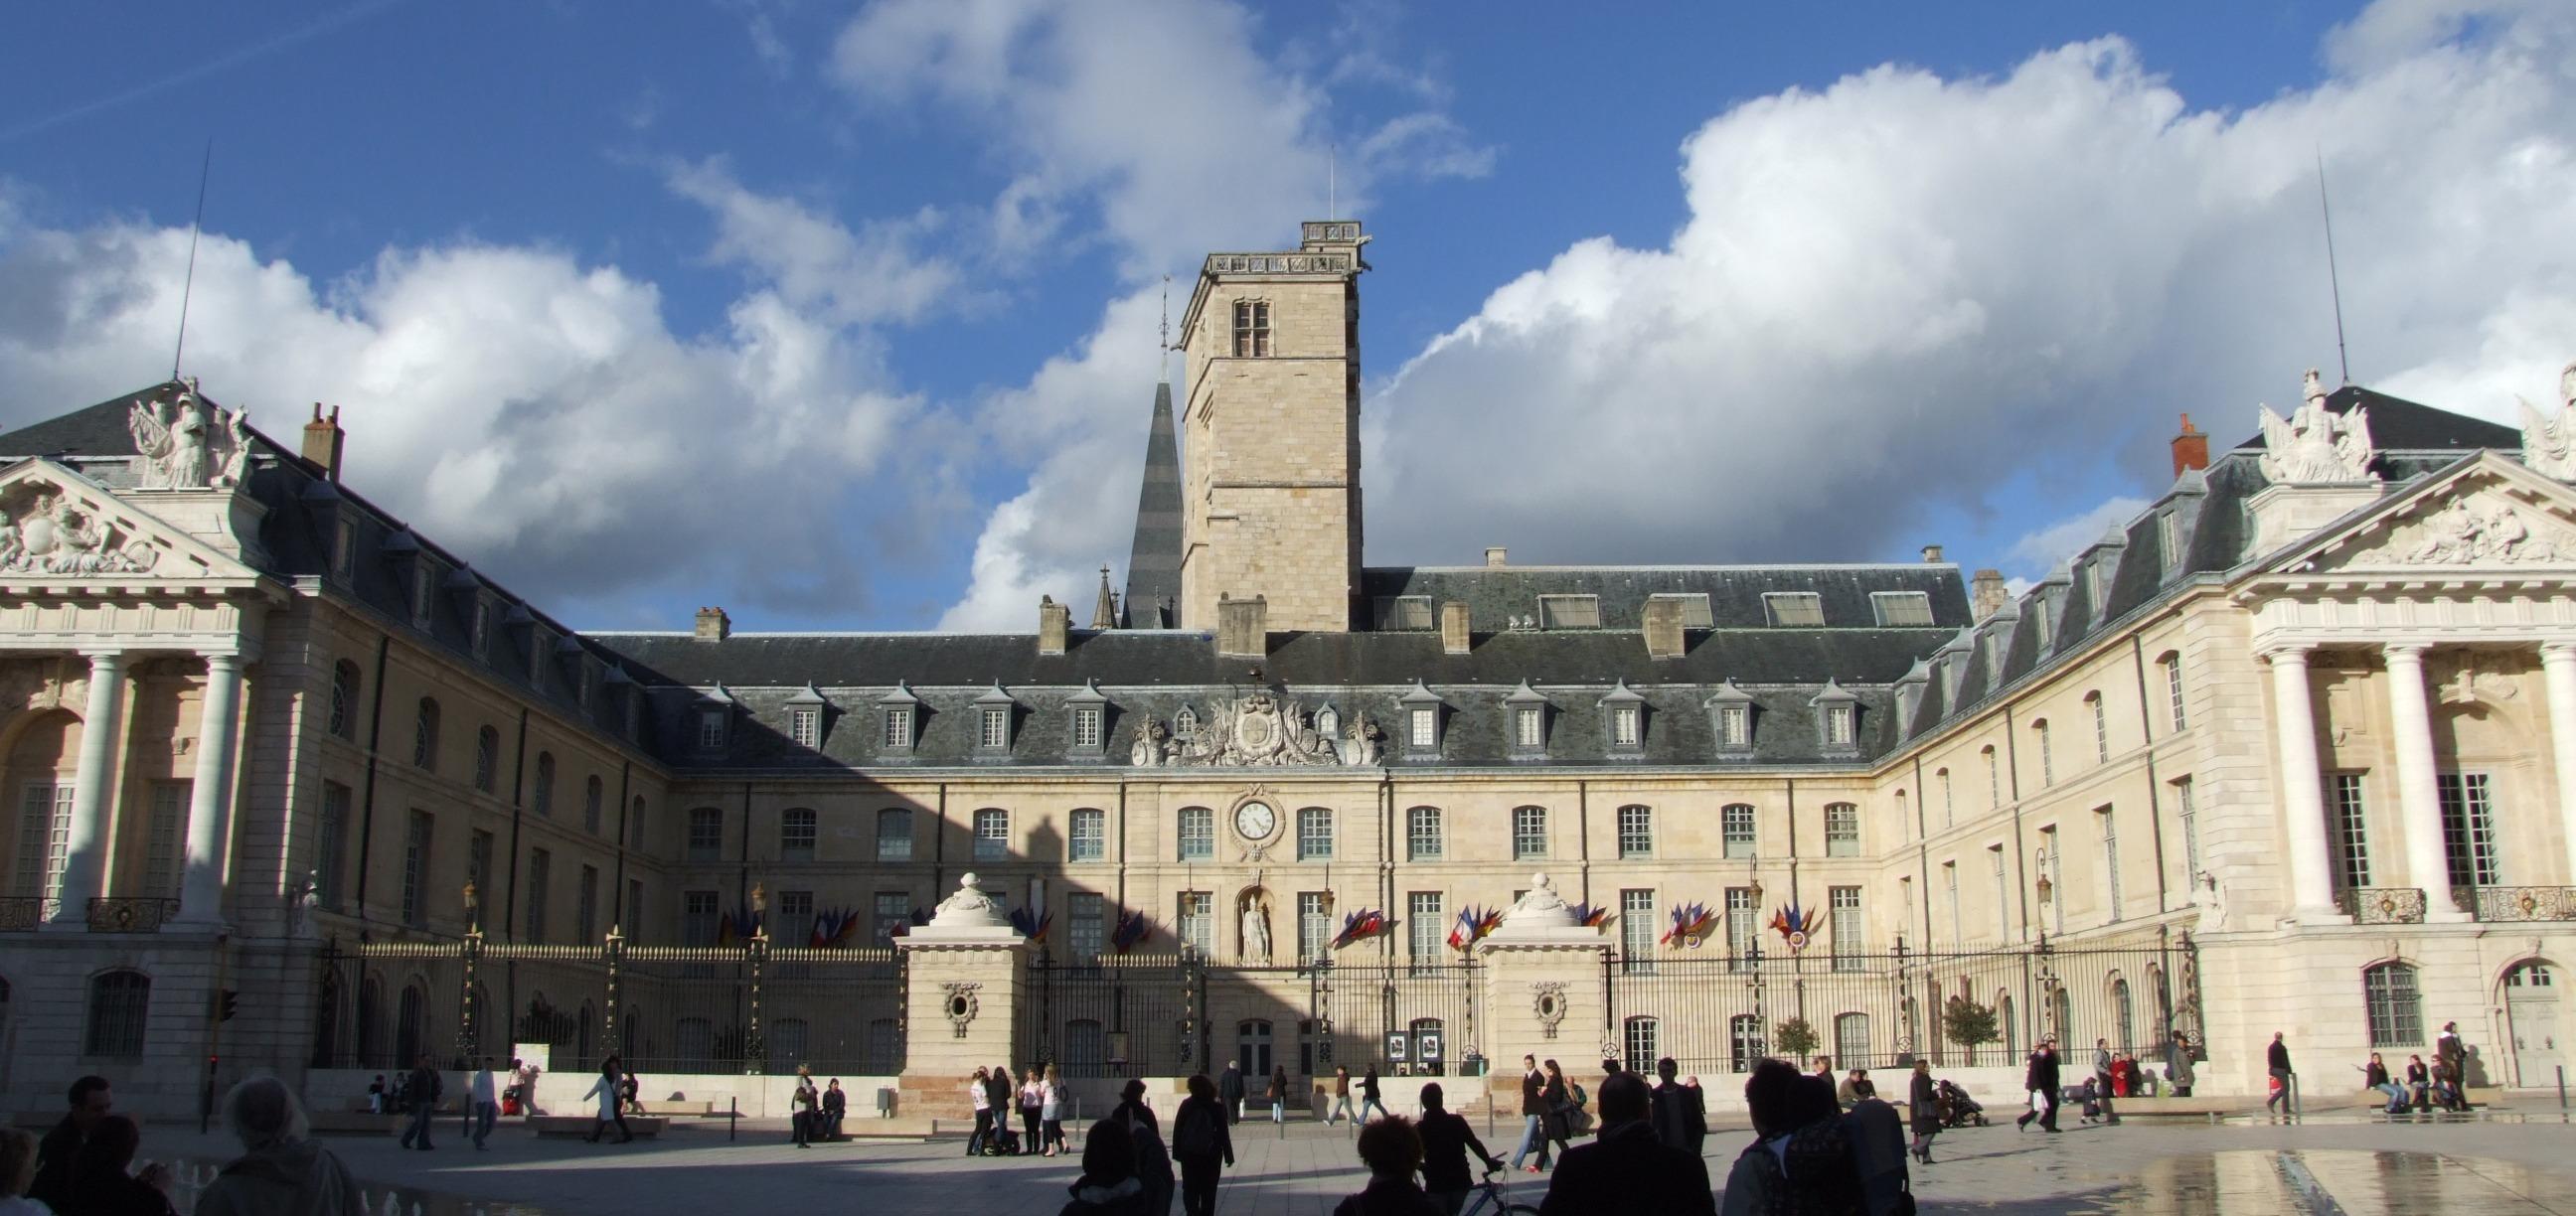 Musee Hotel De Ville De Dijon